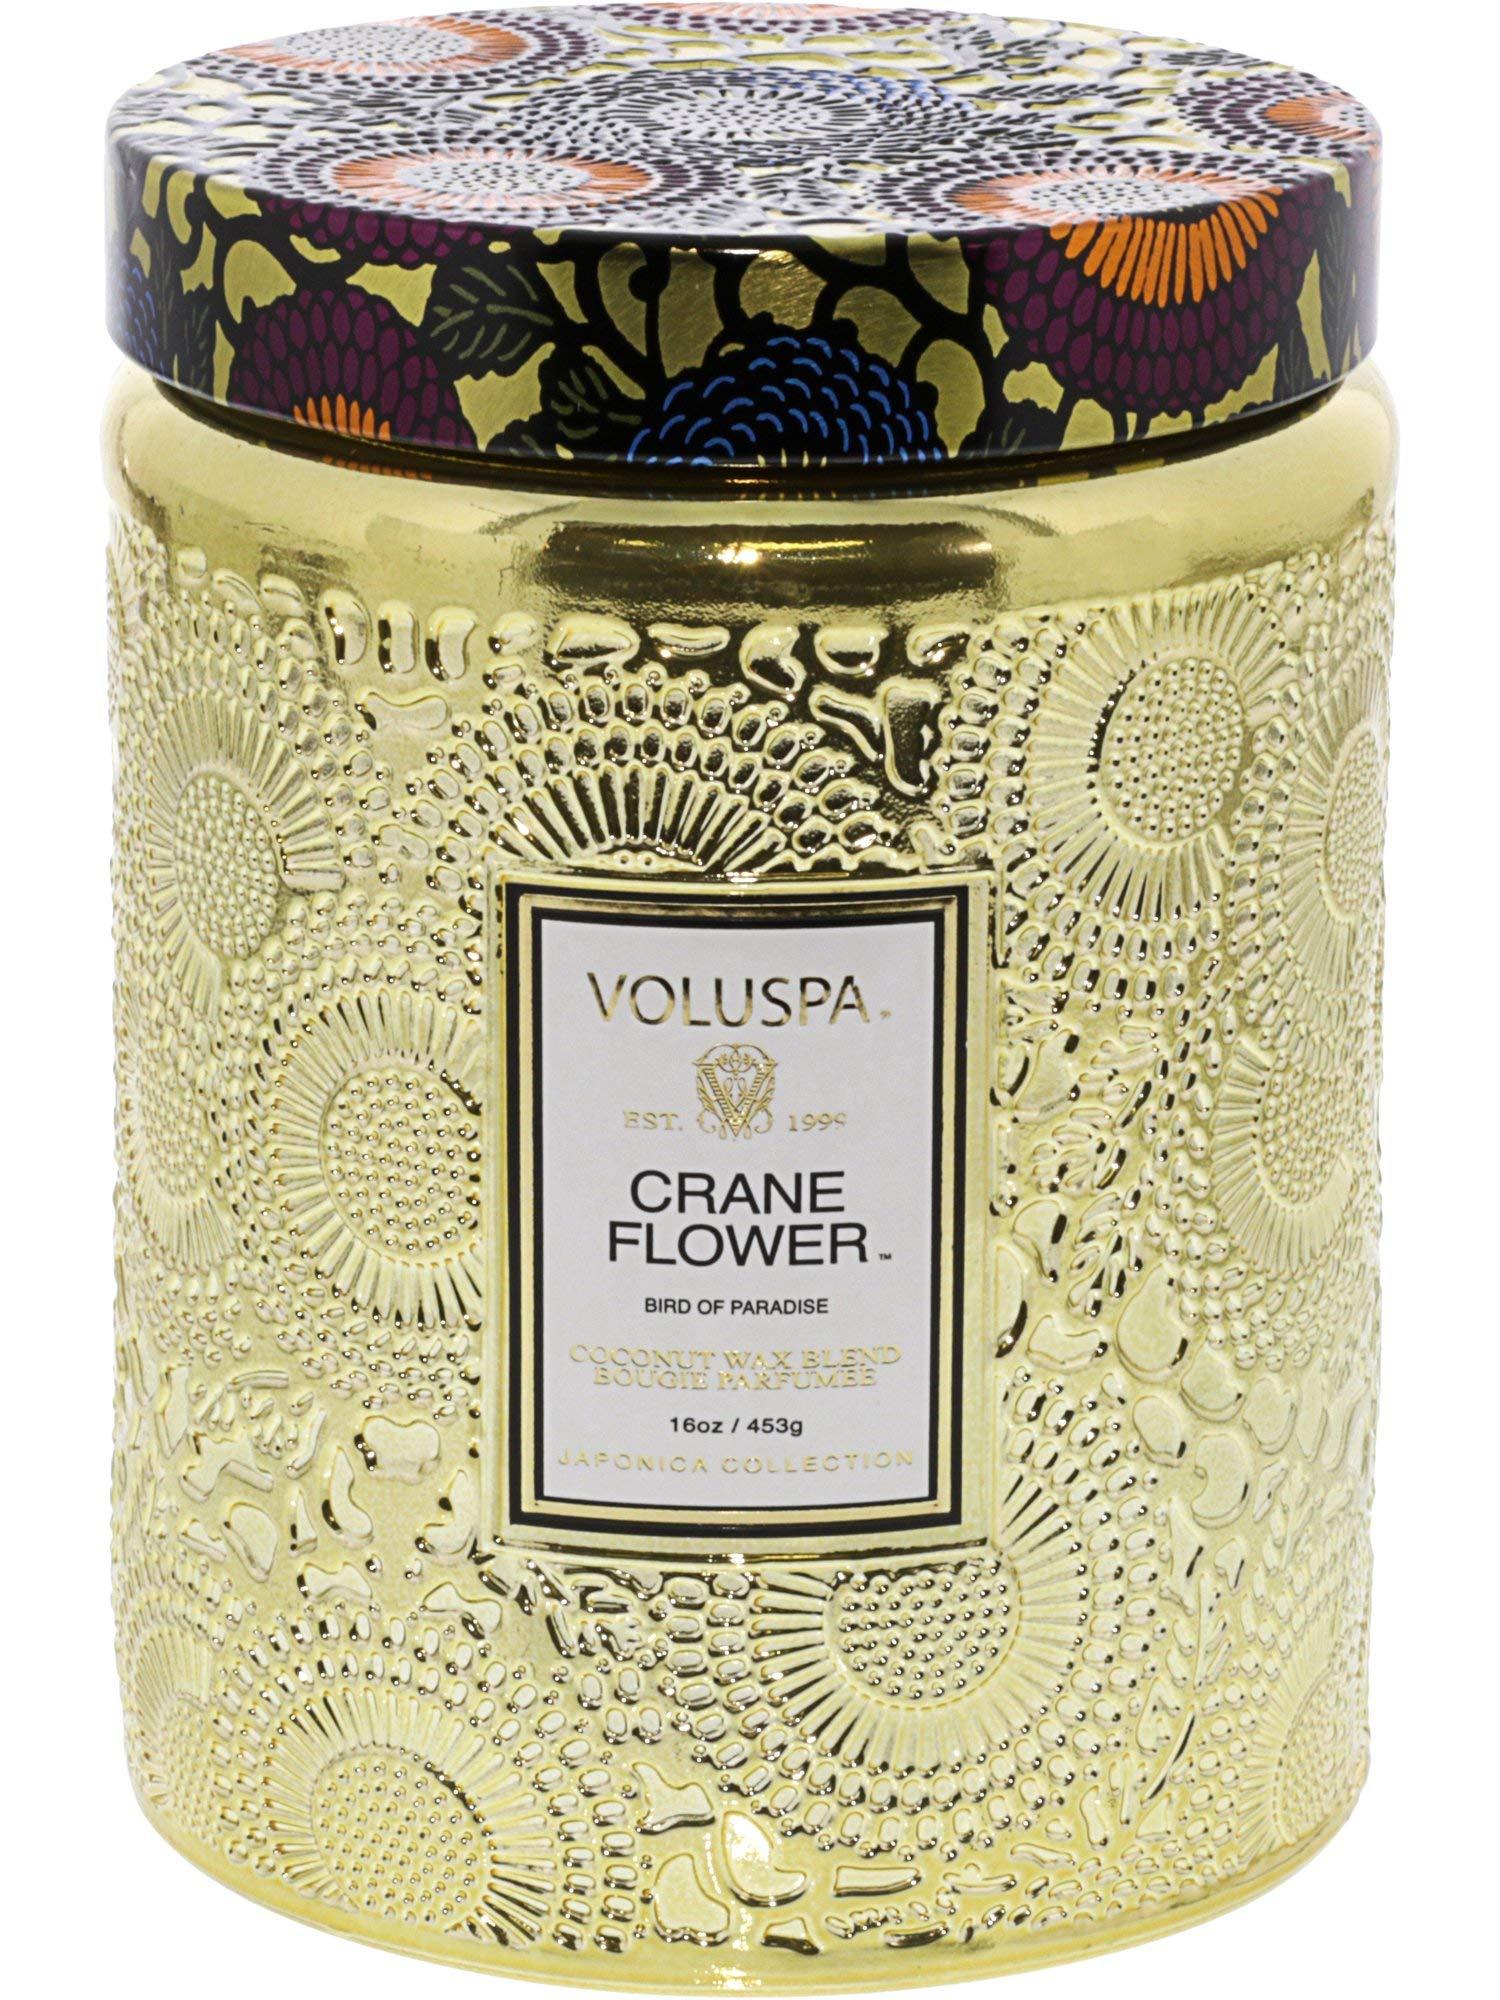 Voluspa Large Embossed Glass Jar Candle Crane Flower 16 oz